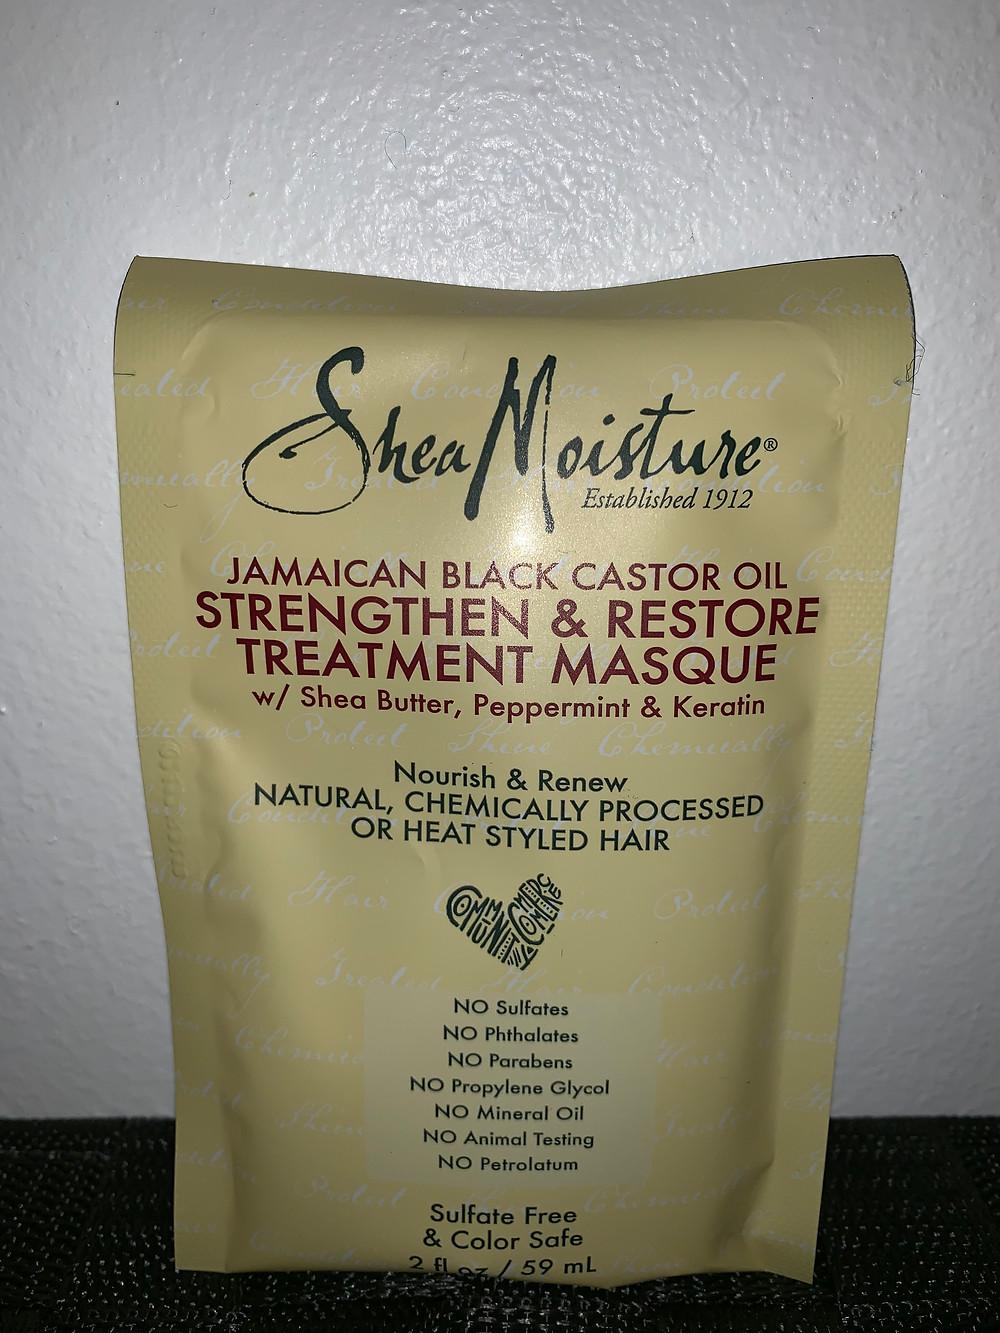 SheaMoisture Castor Oil Treatment Masque